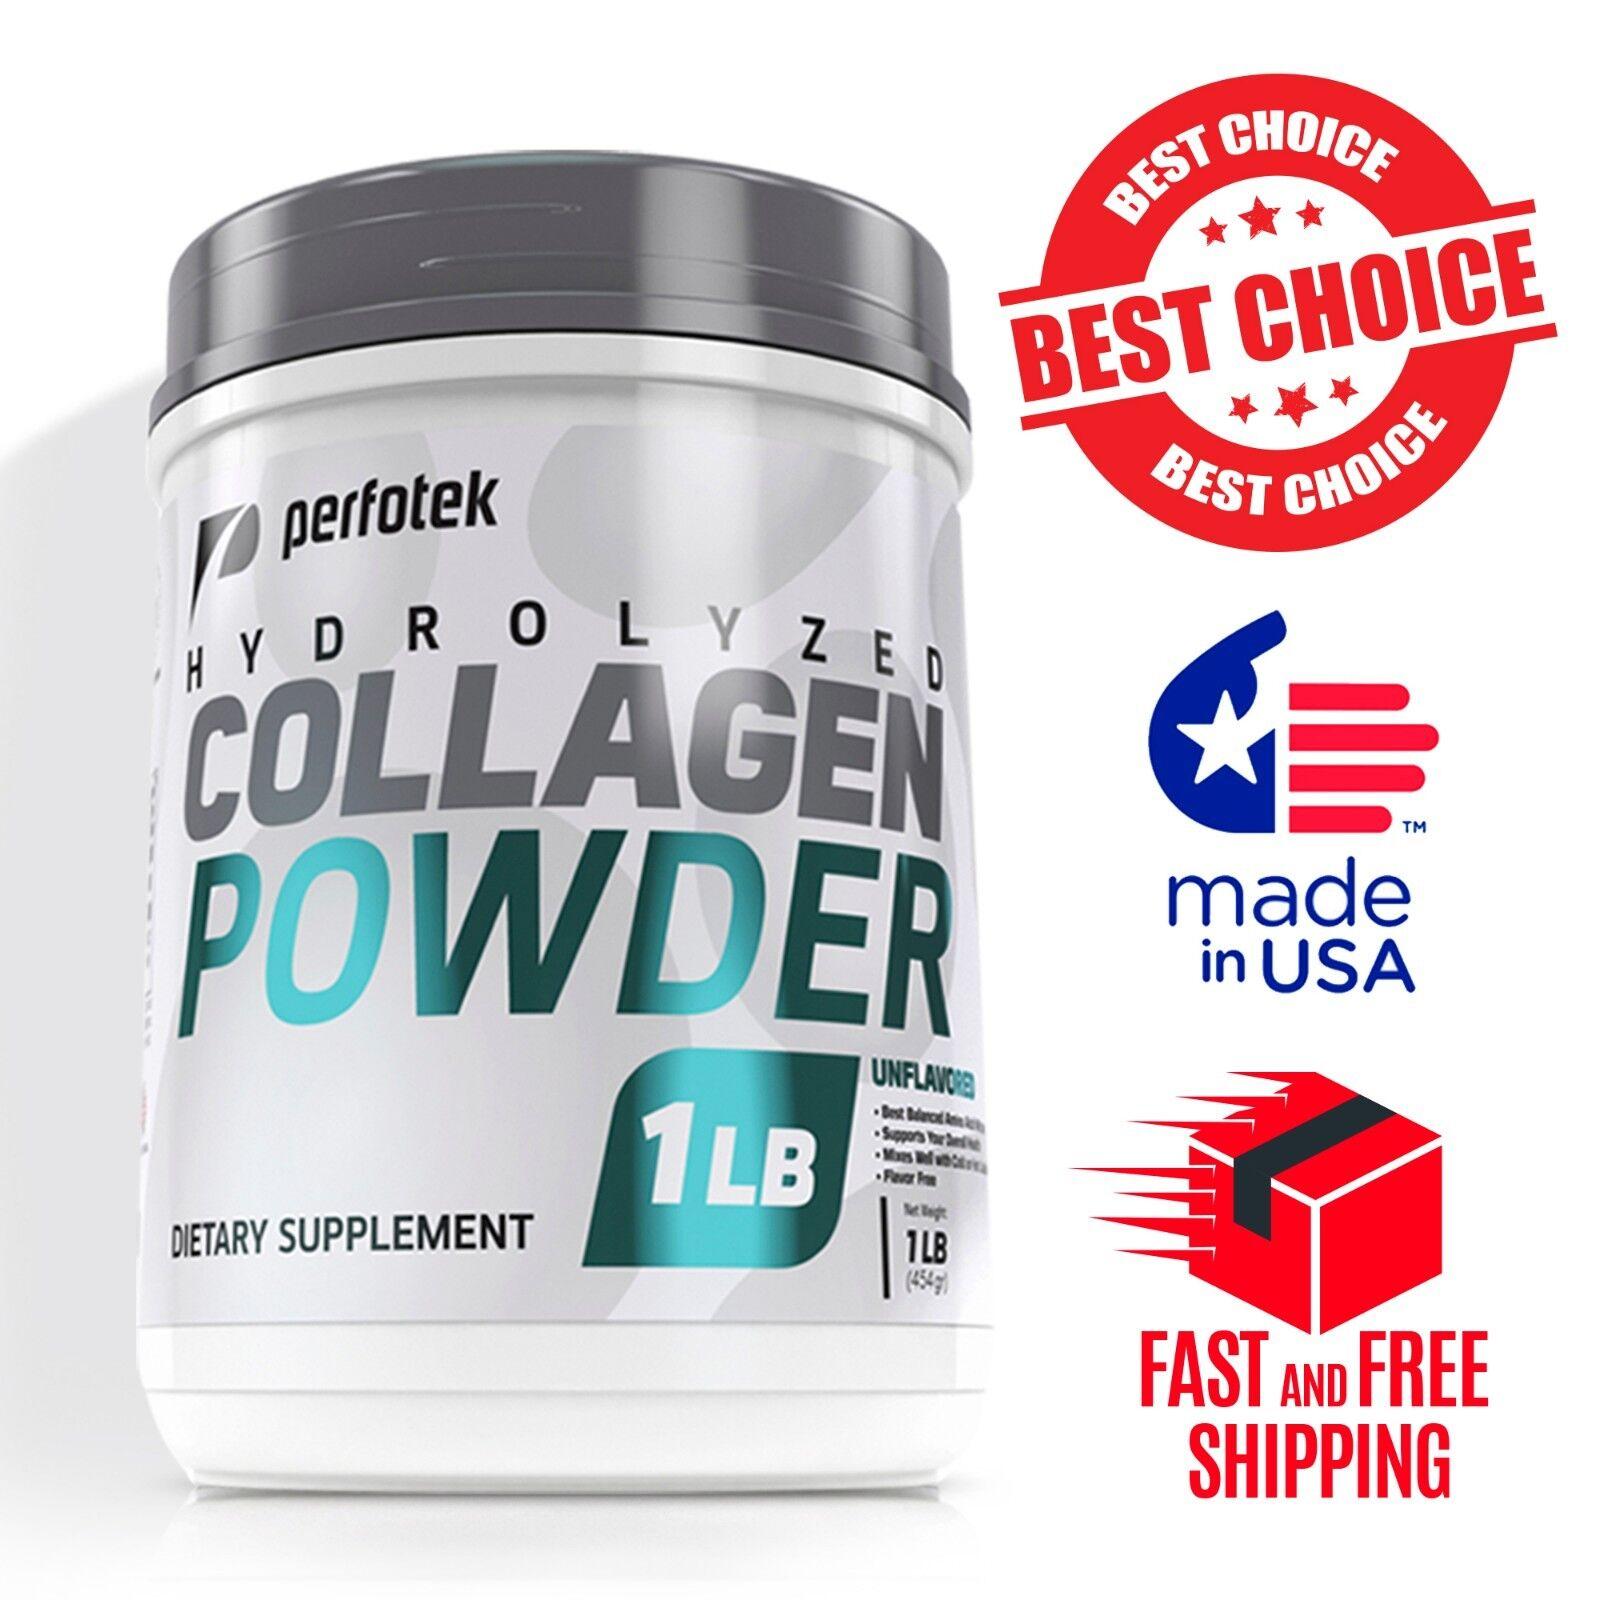 ▶ Premium Collagen Peptides 16 oz Hydrolyzed Anti-Aging Pr